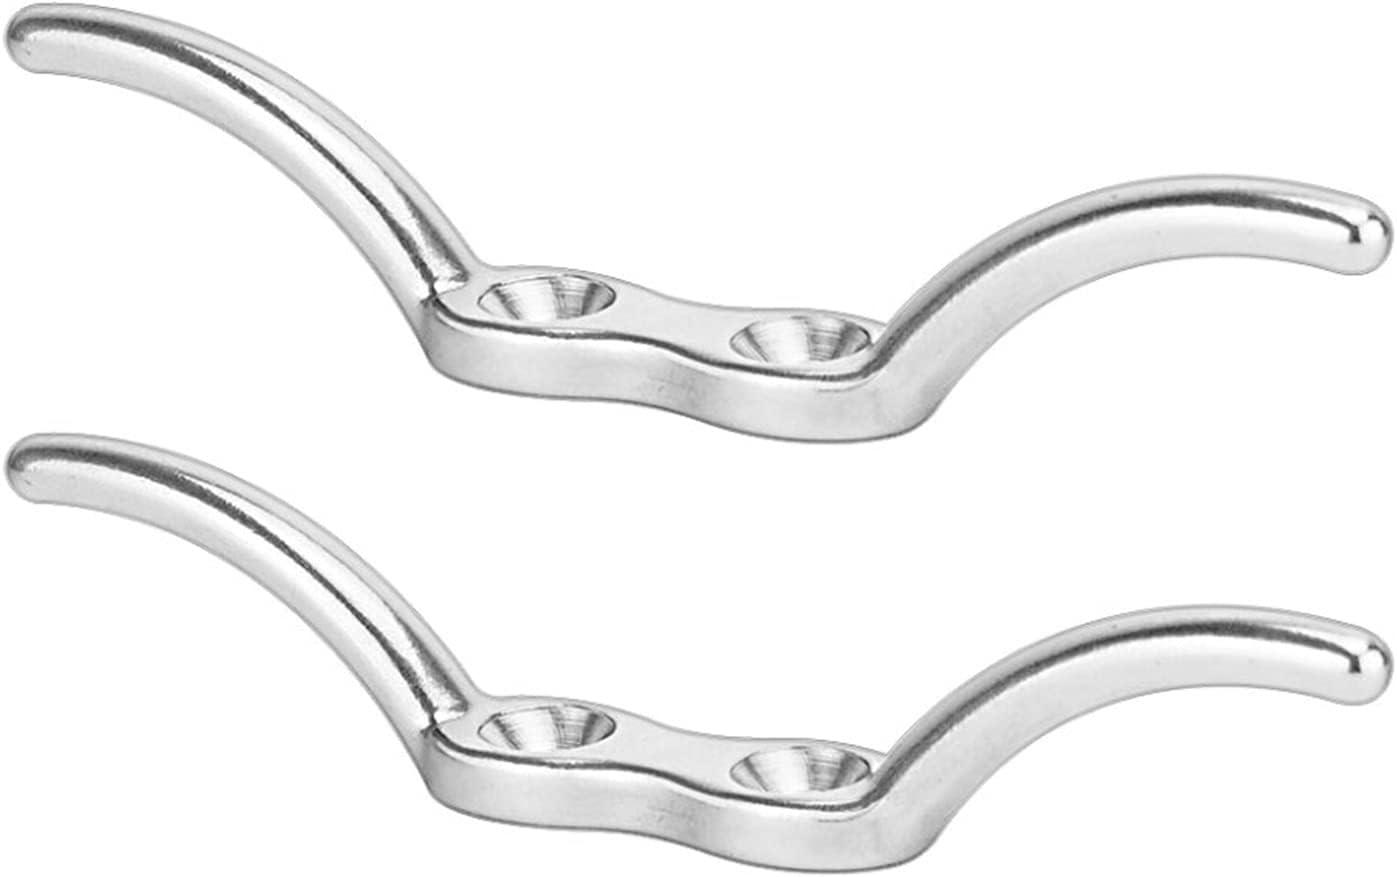 WDONGX Exquisite Door Handle 2PCS Stainless Steel Hook Cleat 316 Atlanta Mall Fresno Mall